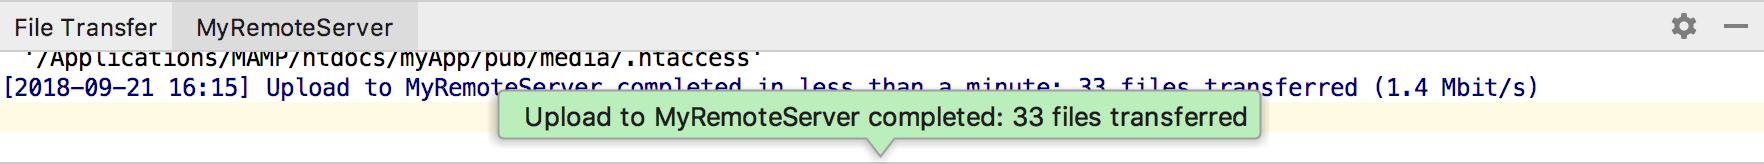 Deployment File Transfer